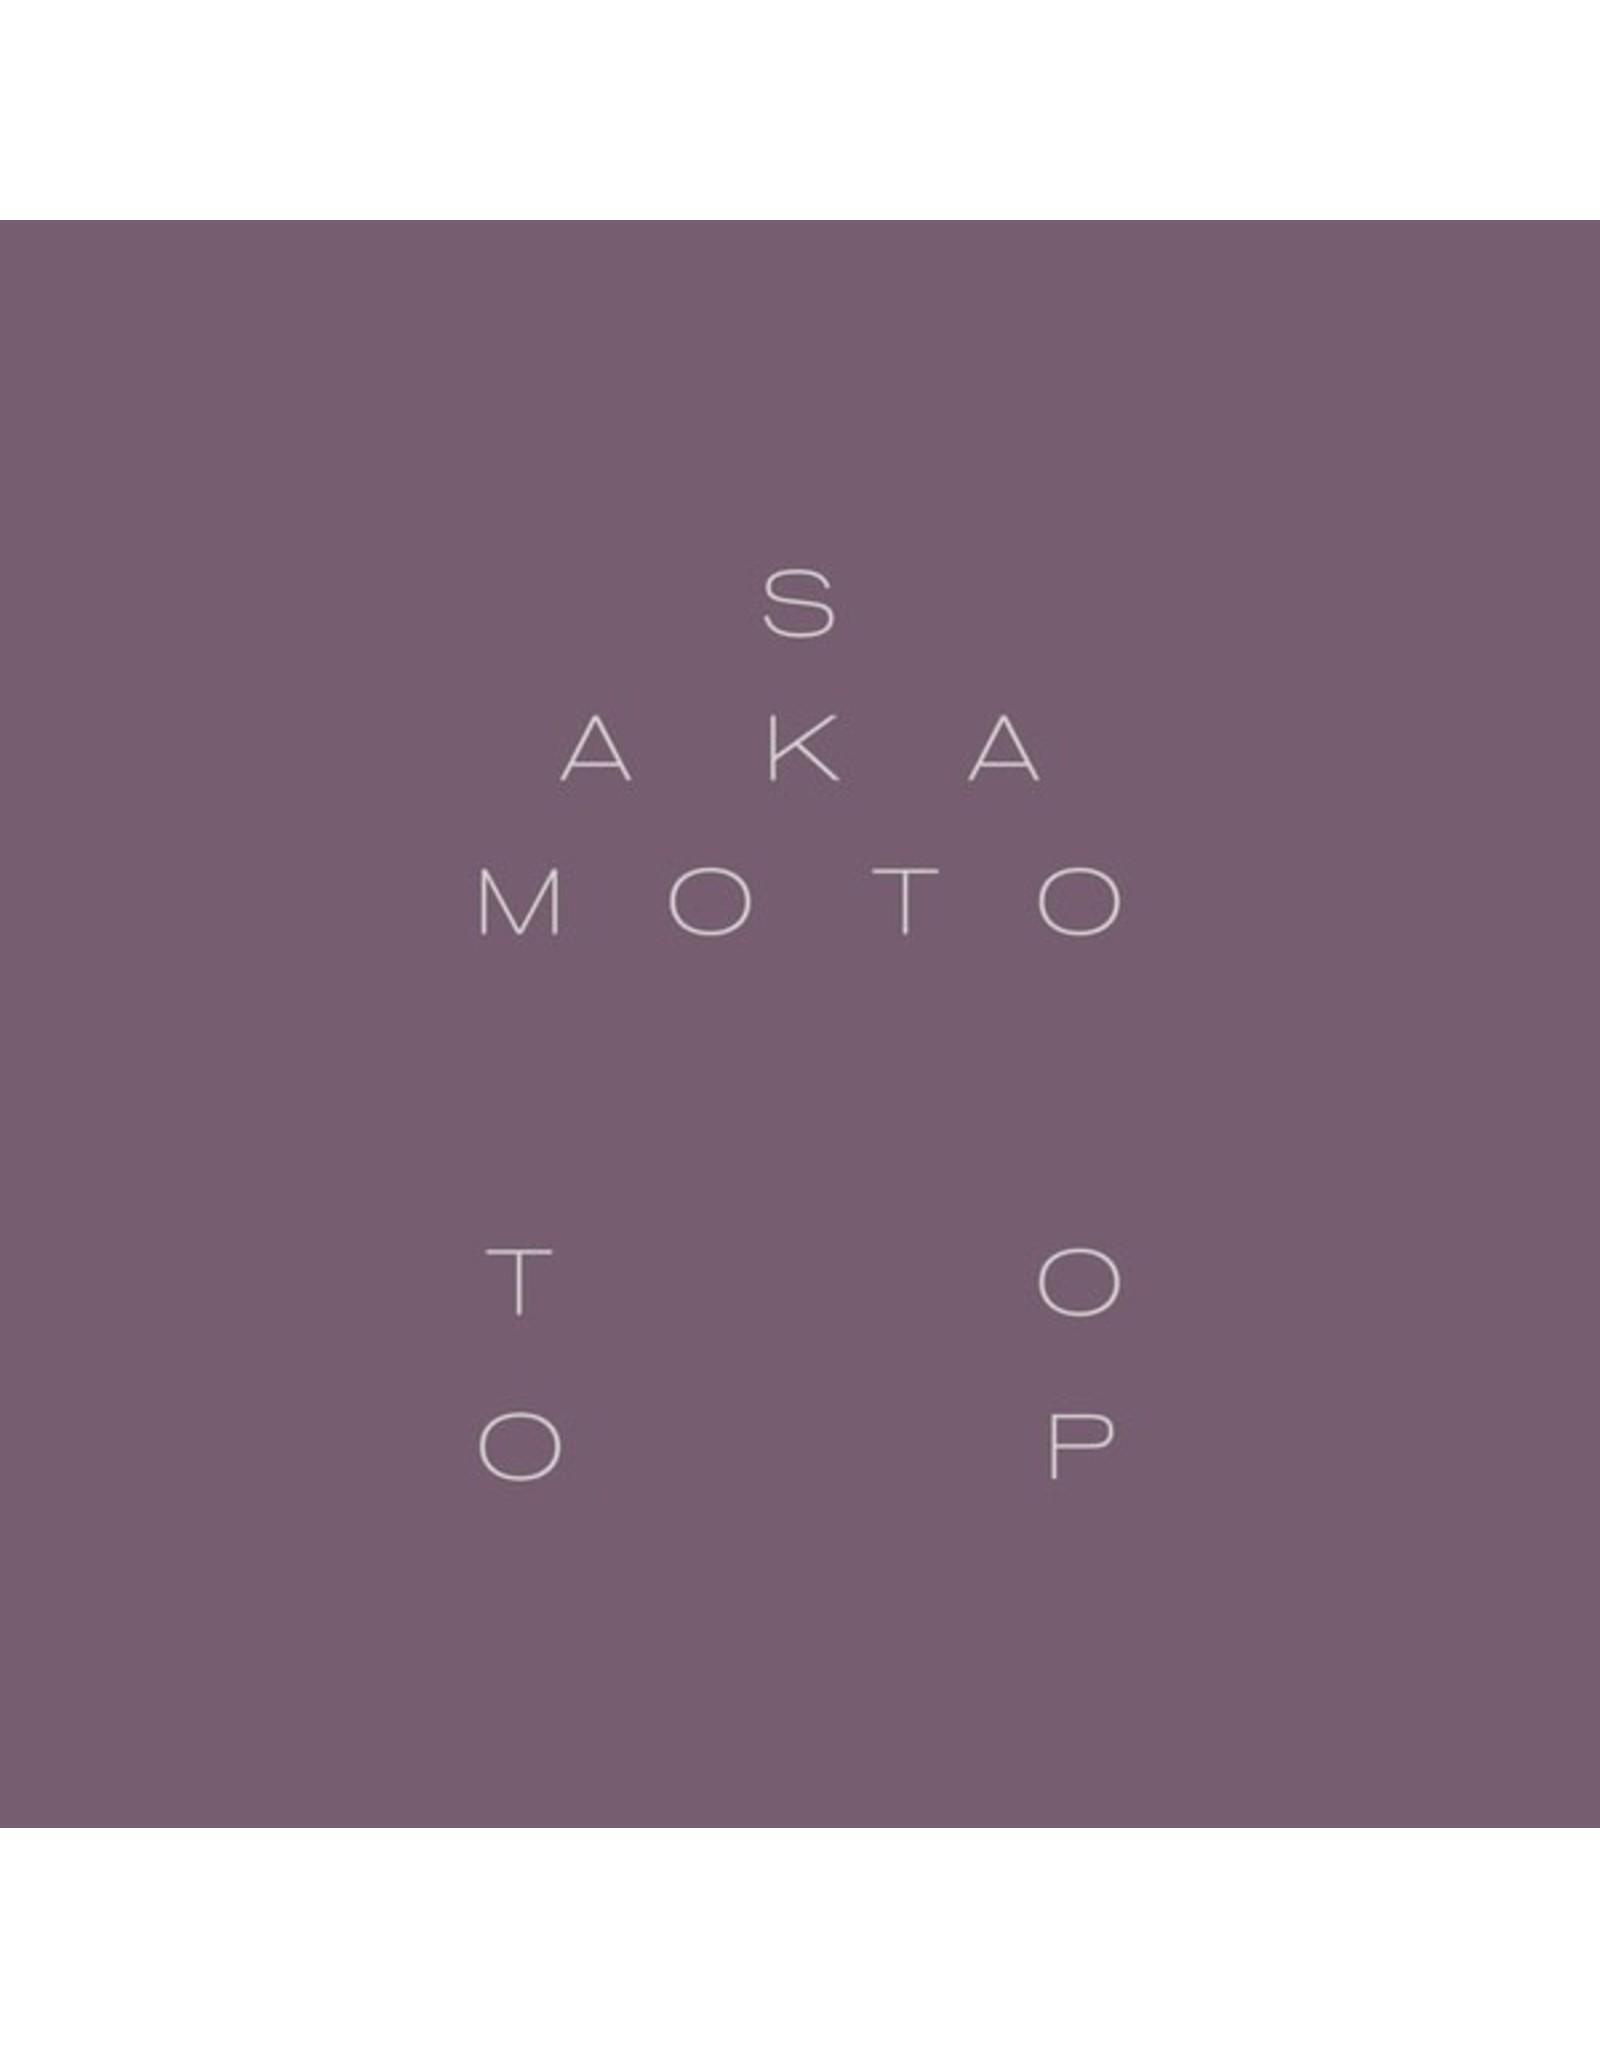 Thirtythree Thirtythree Sakamoto/Toop: Garden of Shadows and Light LP